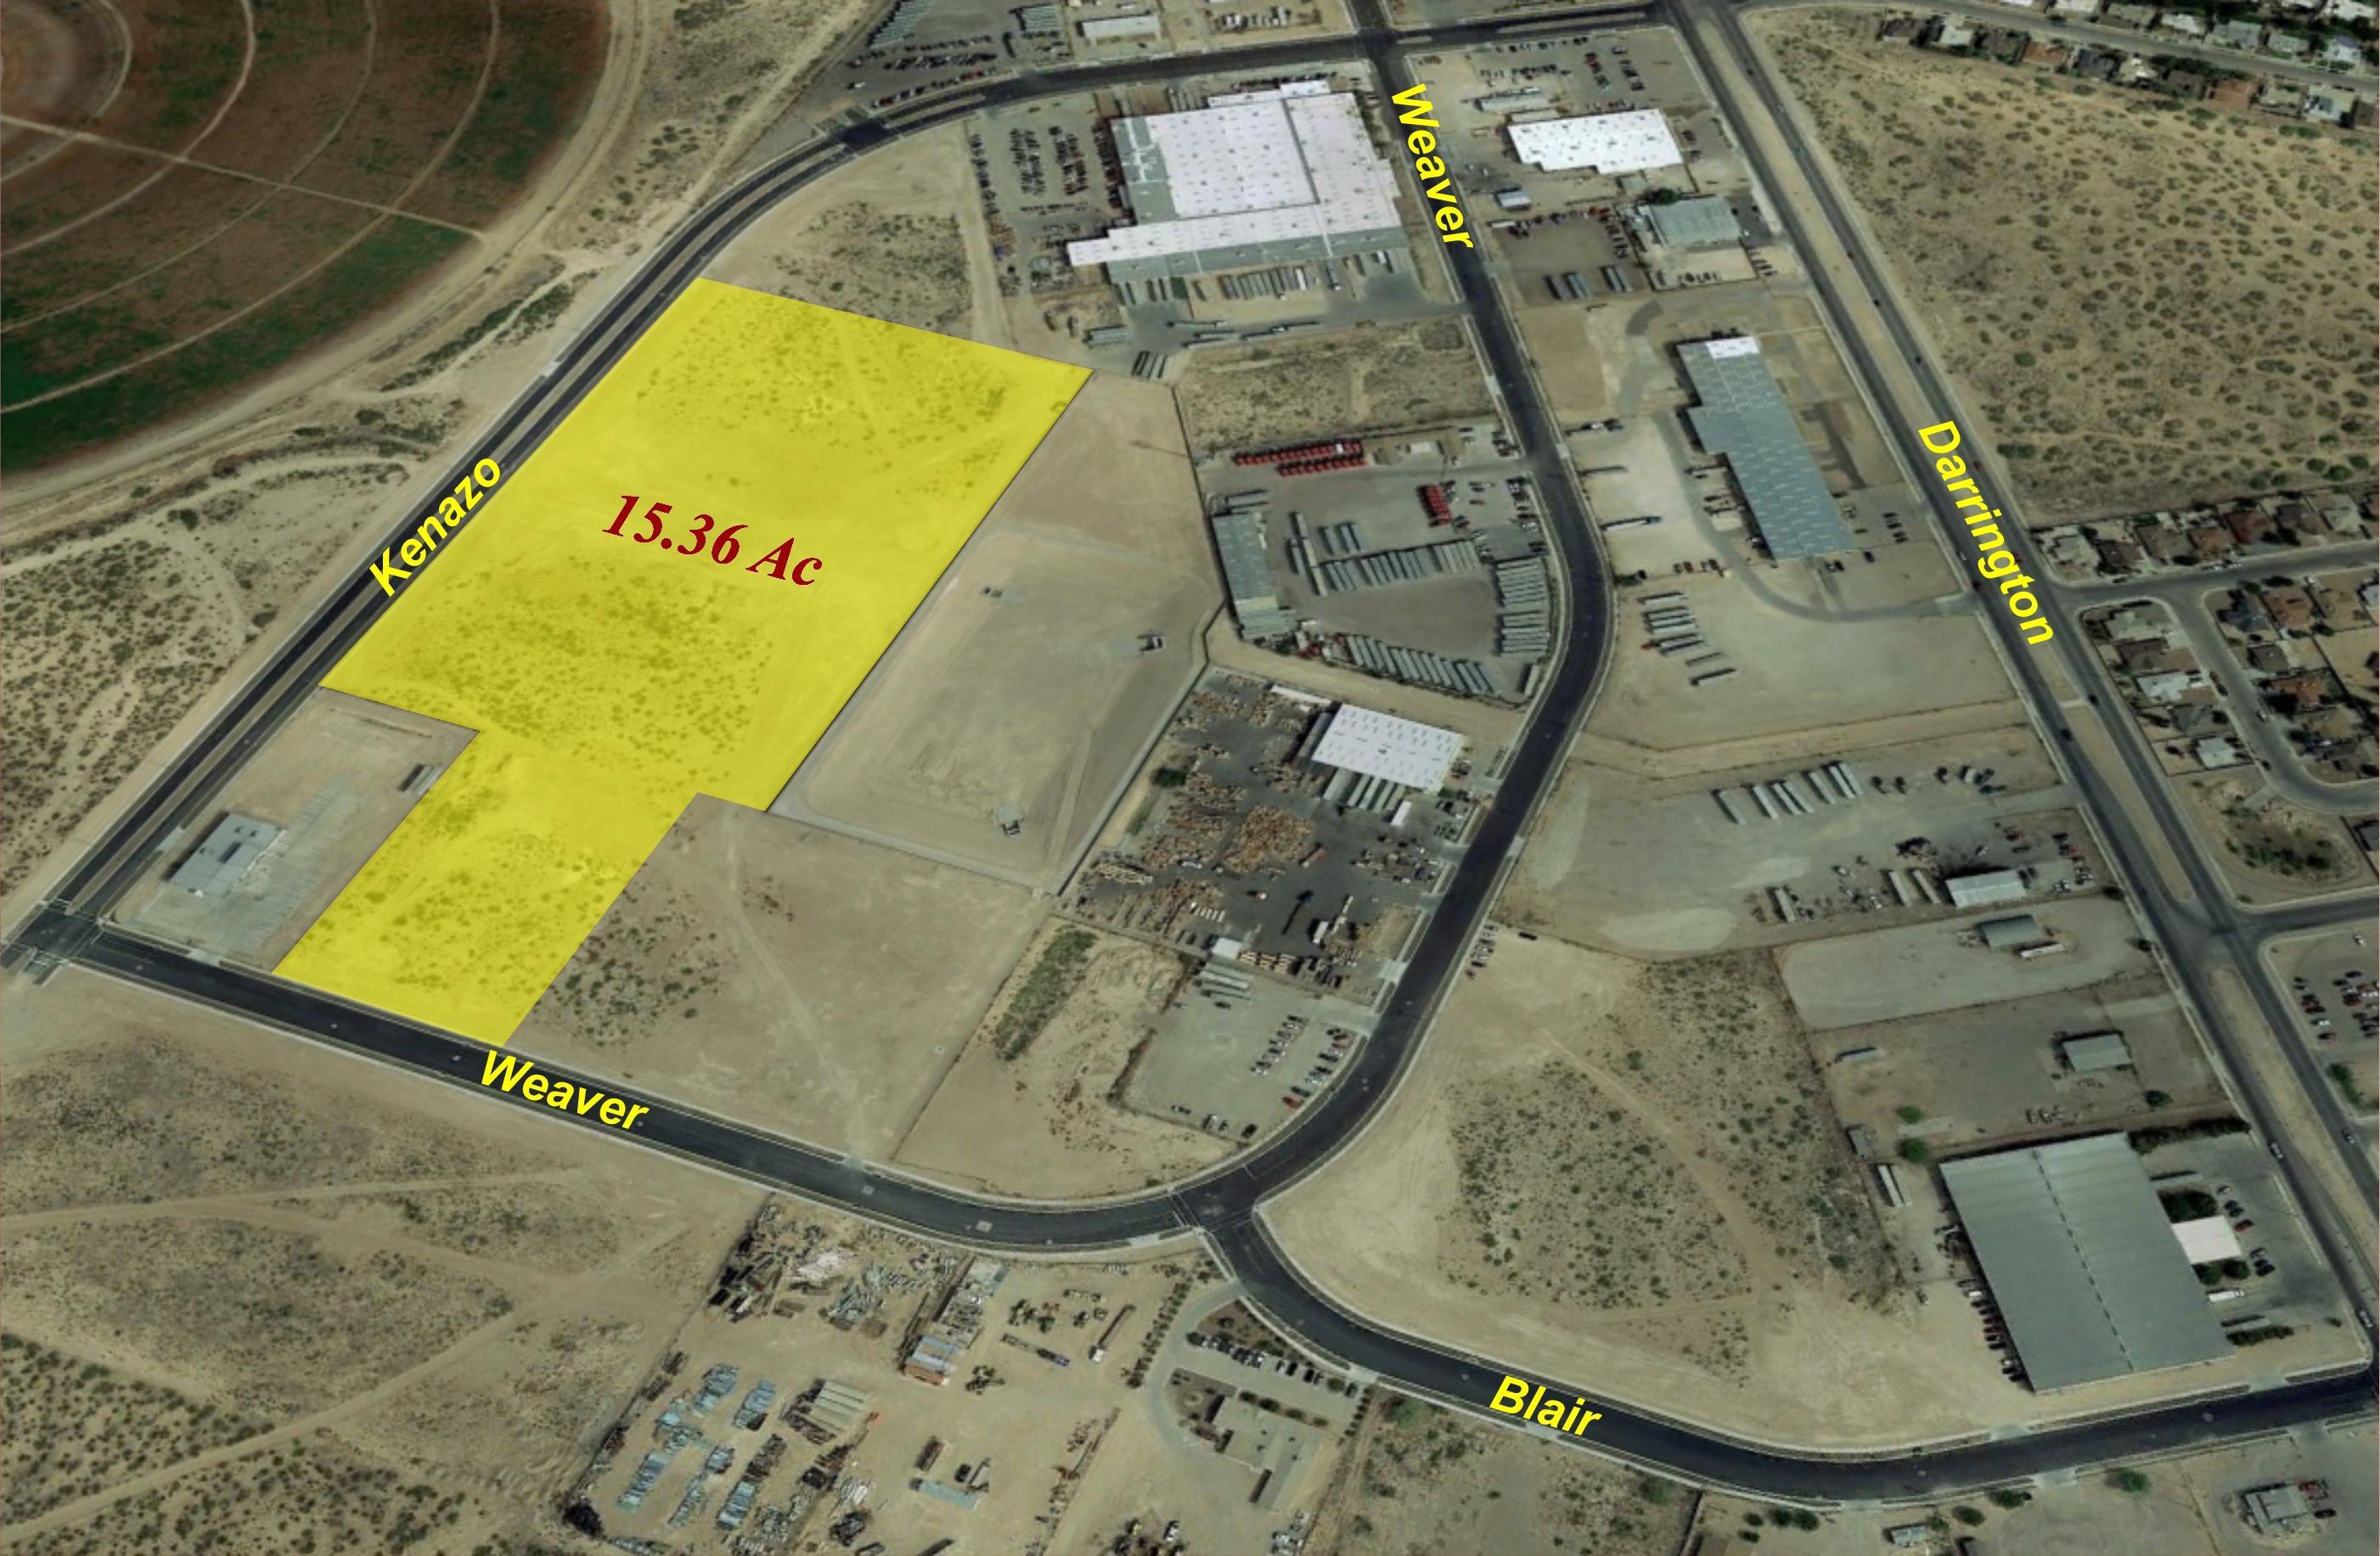 1 Weaver Rd, El Paso, Texas 79928, ,Land,For sale,Weaver Rd,813694